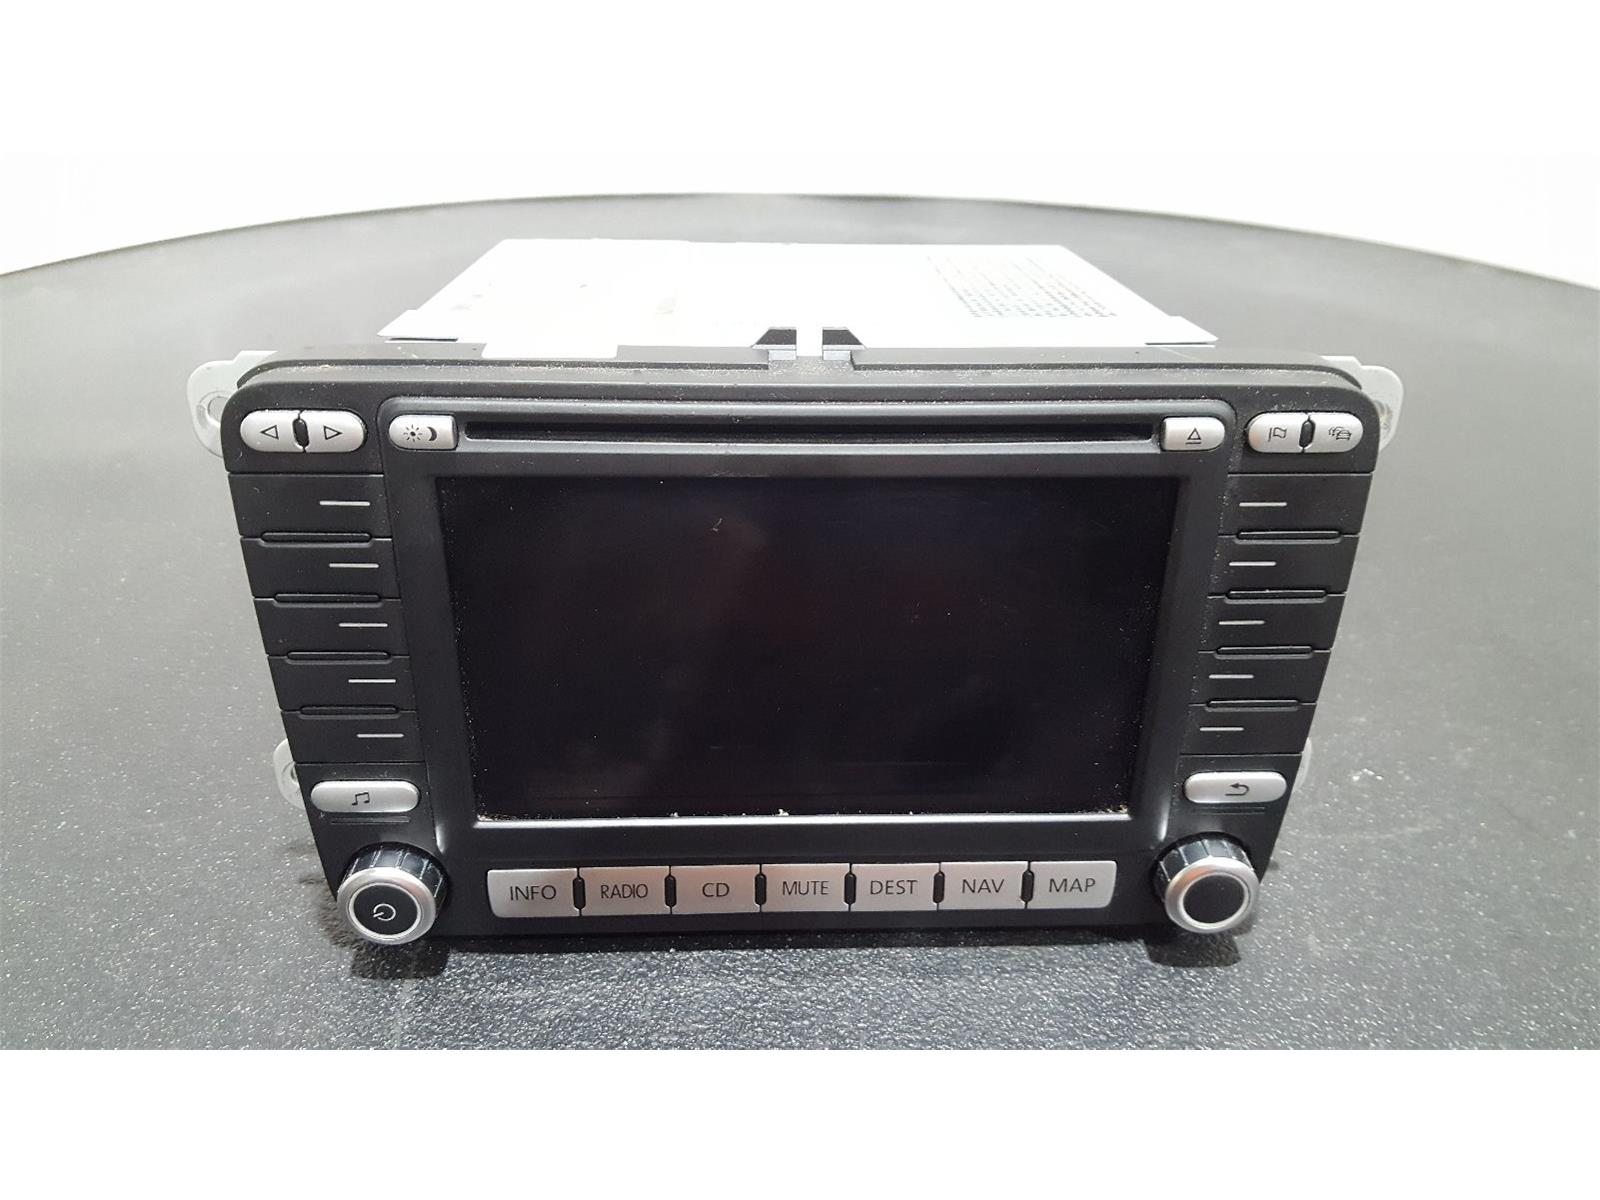 Volkswagen Jetta 2006 To 2011 CD Player Stereo Headunit 1K0035198C